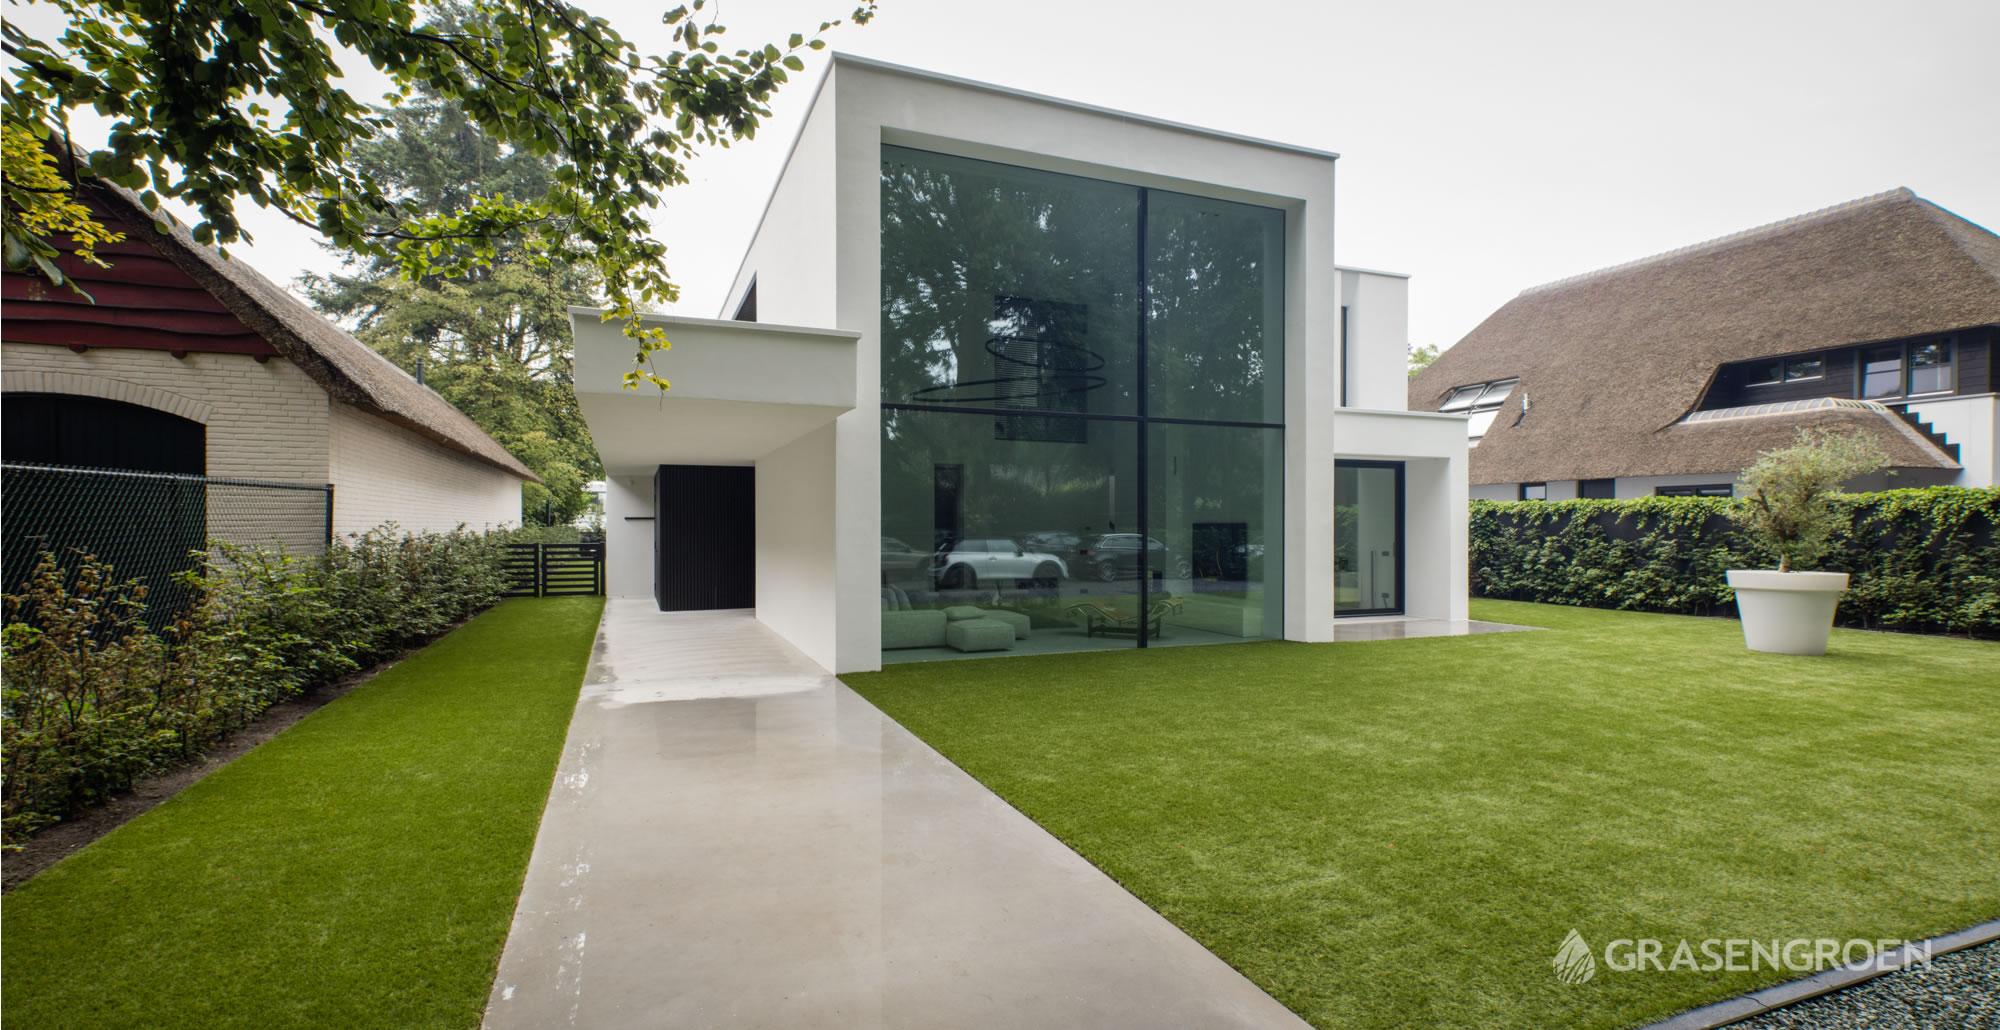 Kunstgrasleggenturnhout11 • Gras en Groen Kunstgras